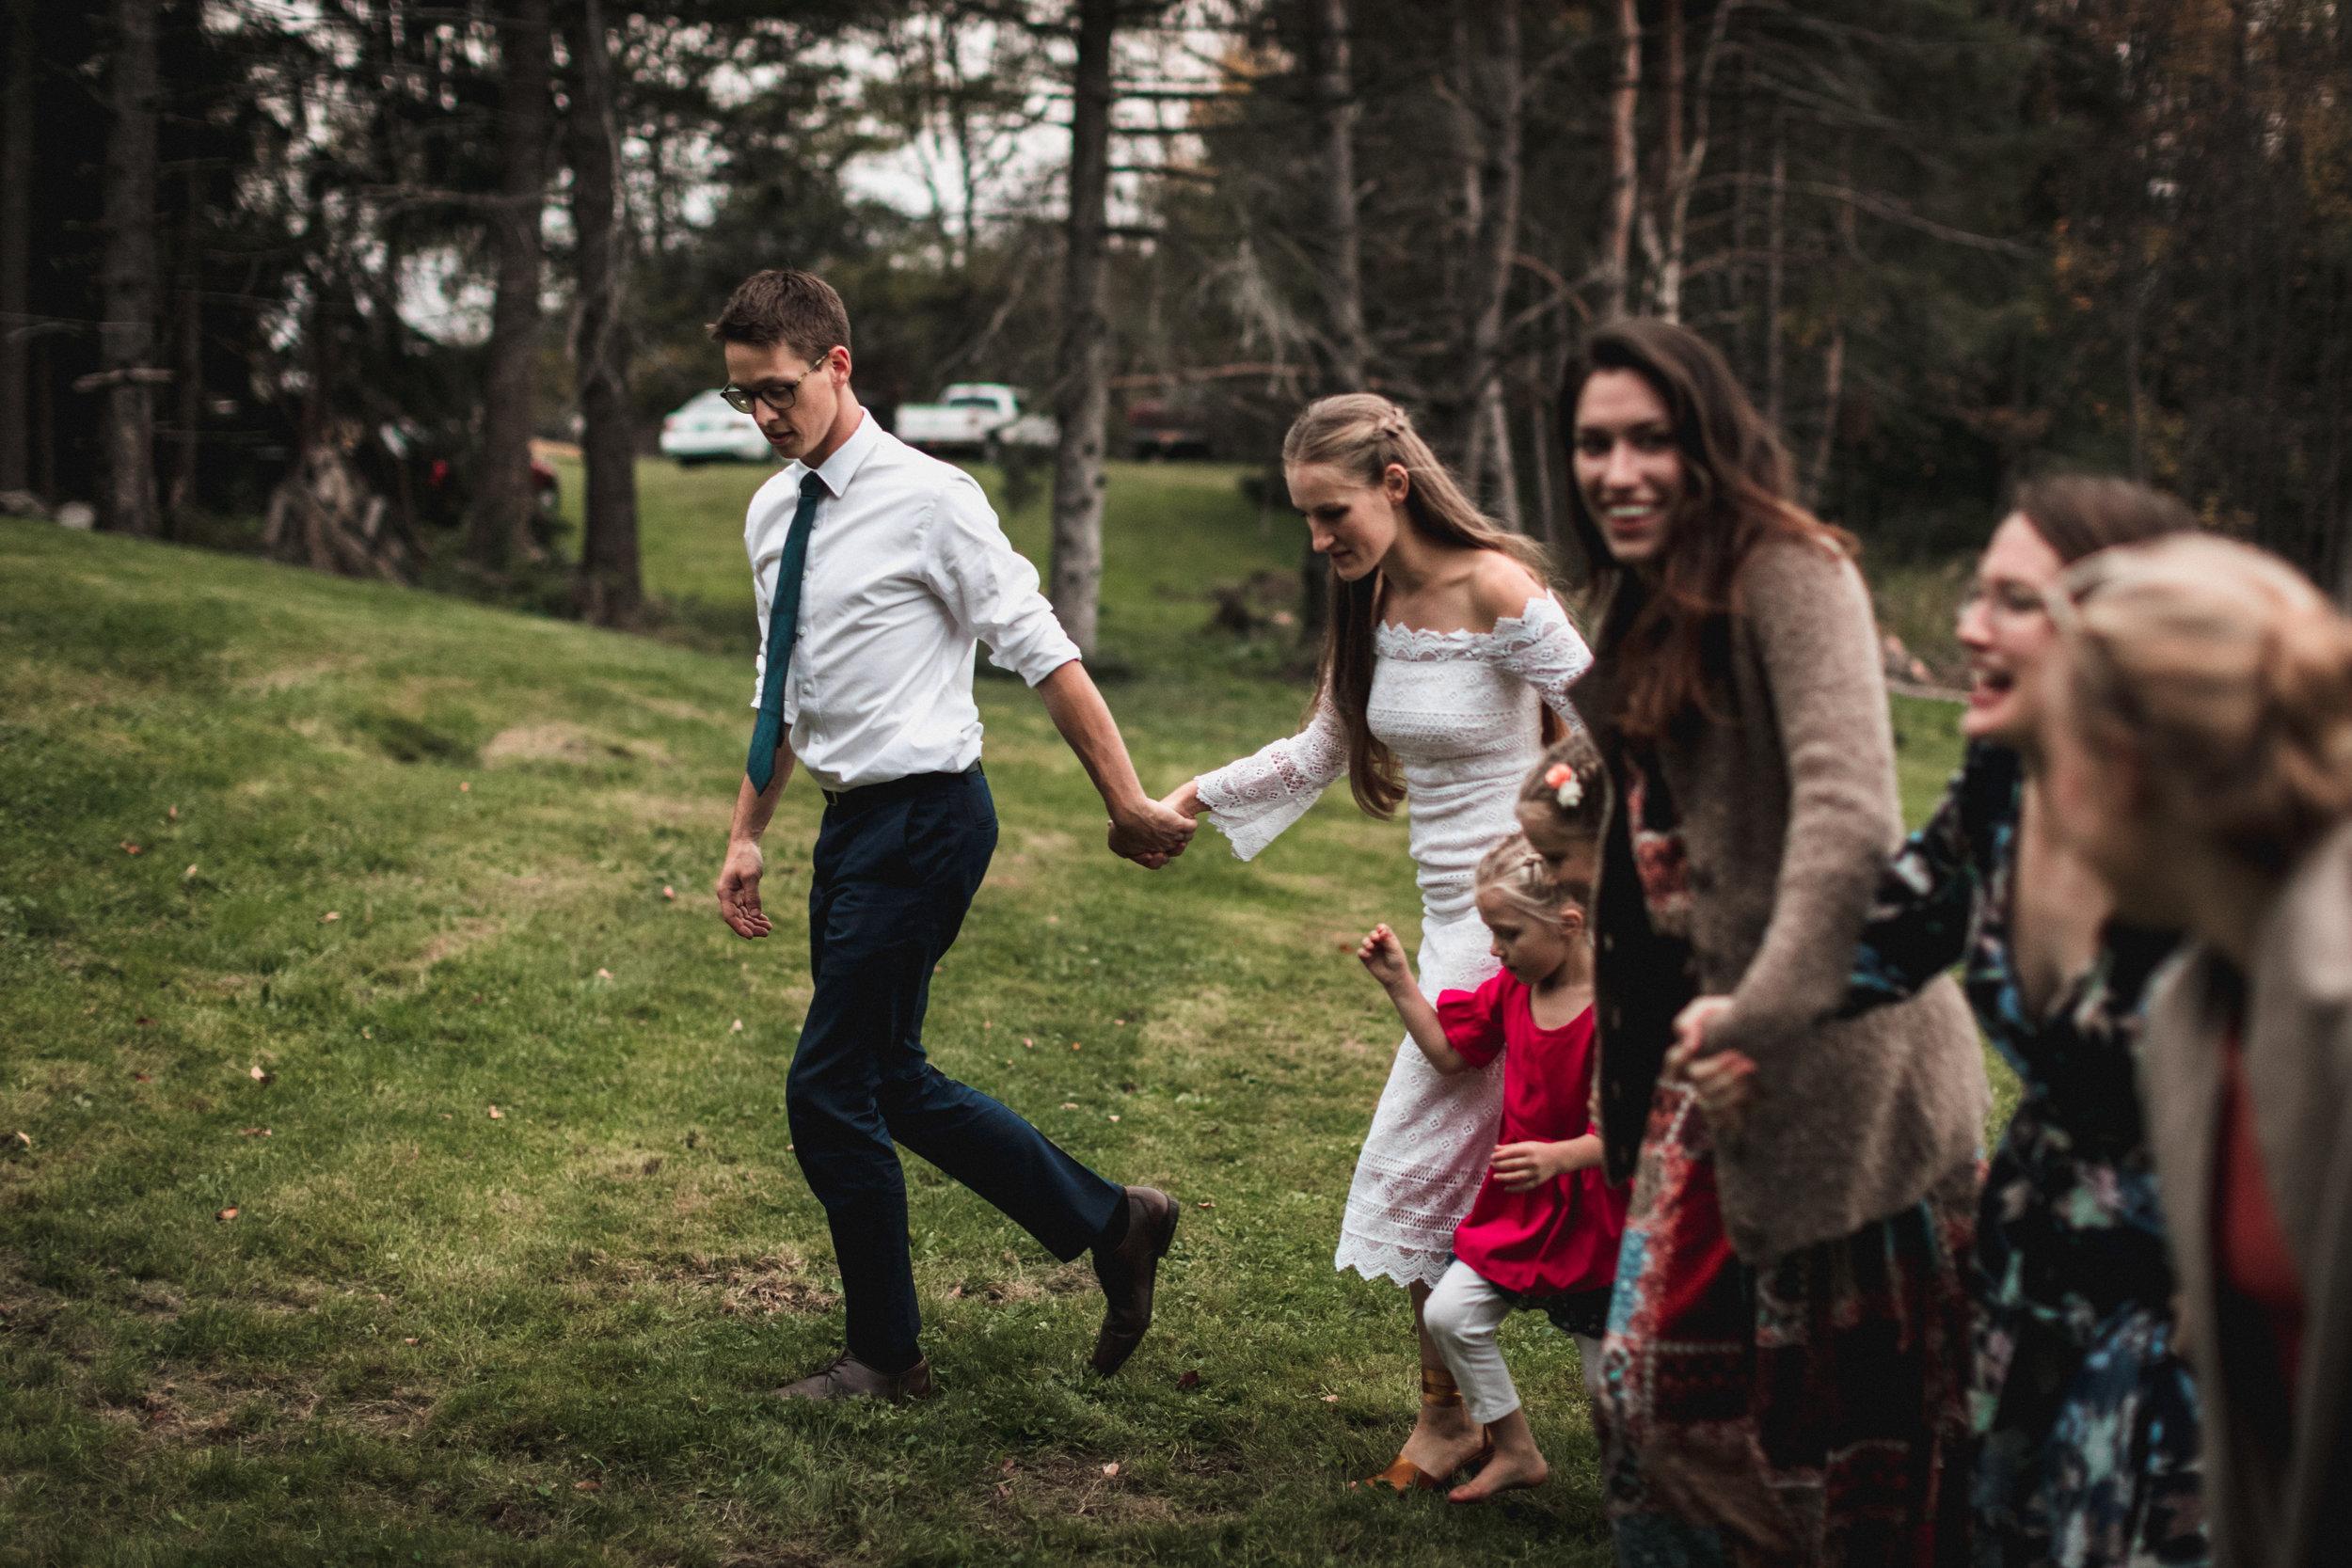 vild-photography-photographer-tahoe-intimate-wedding-adventure-van-abigail-318.jpg